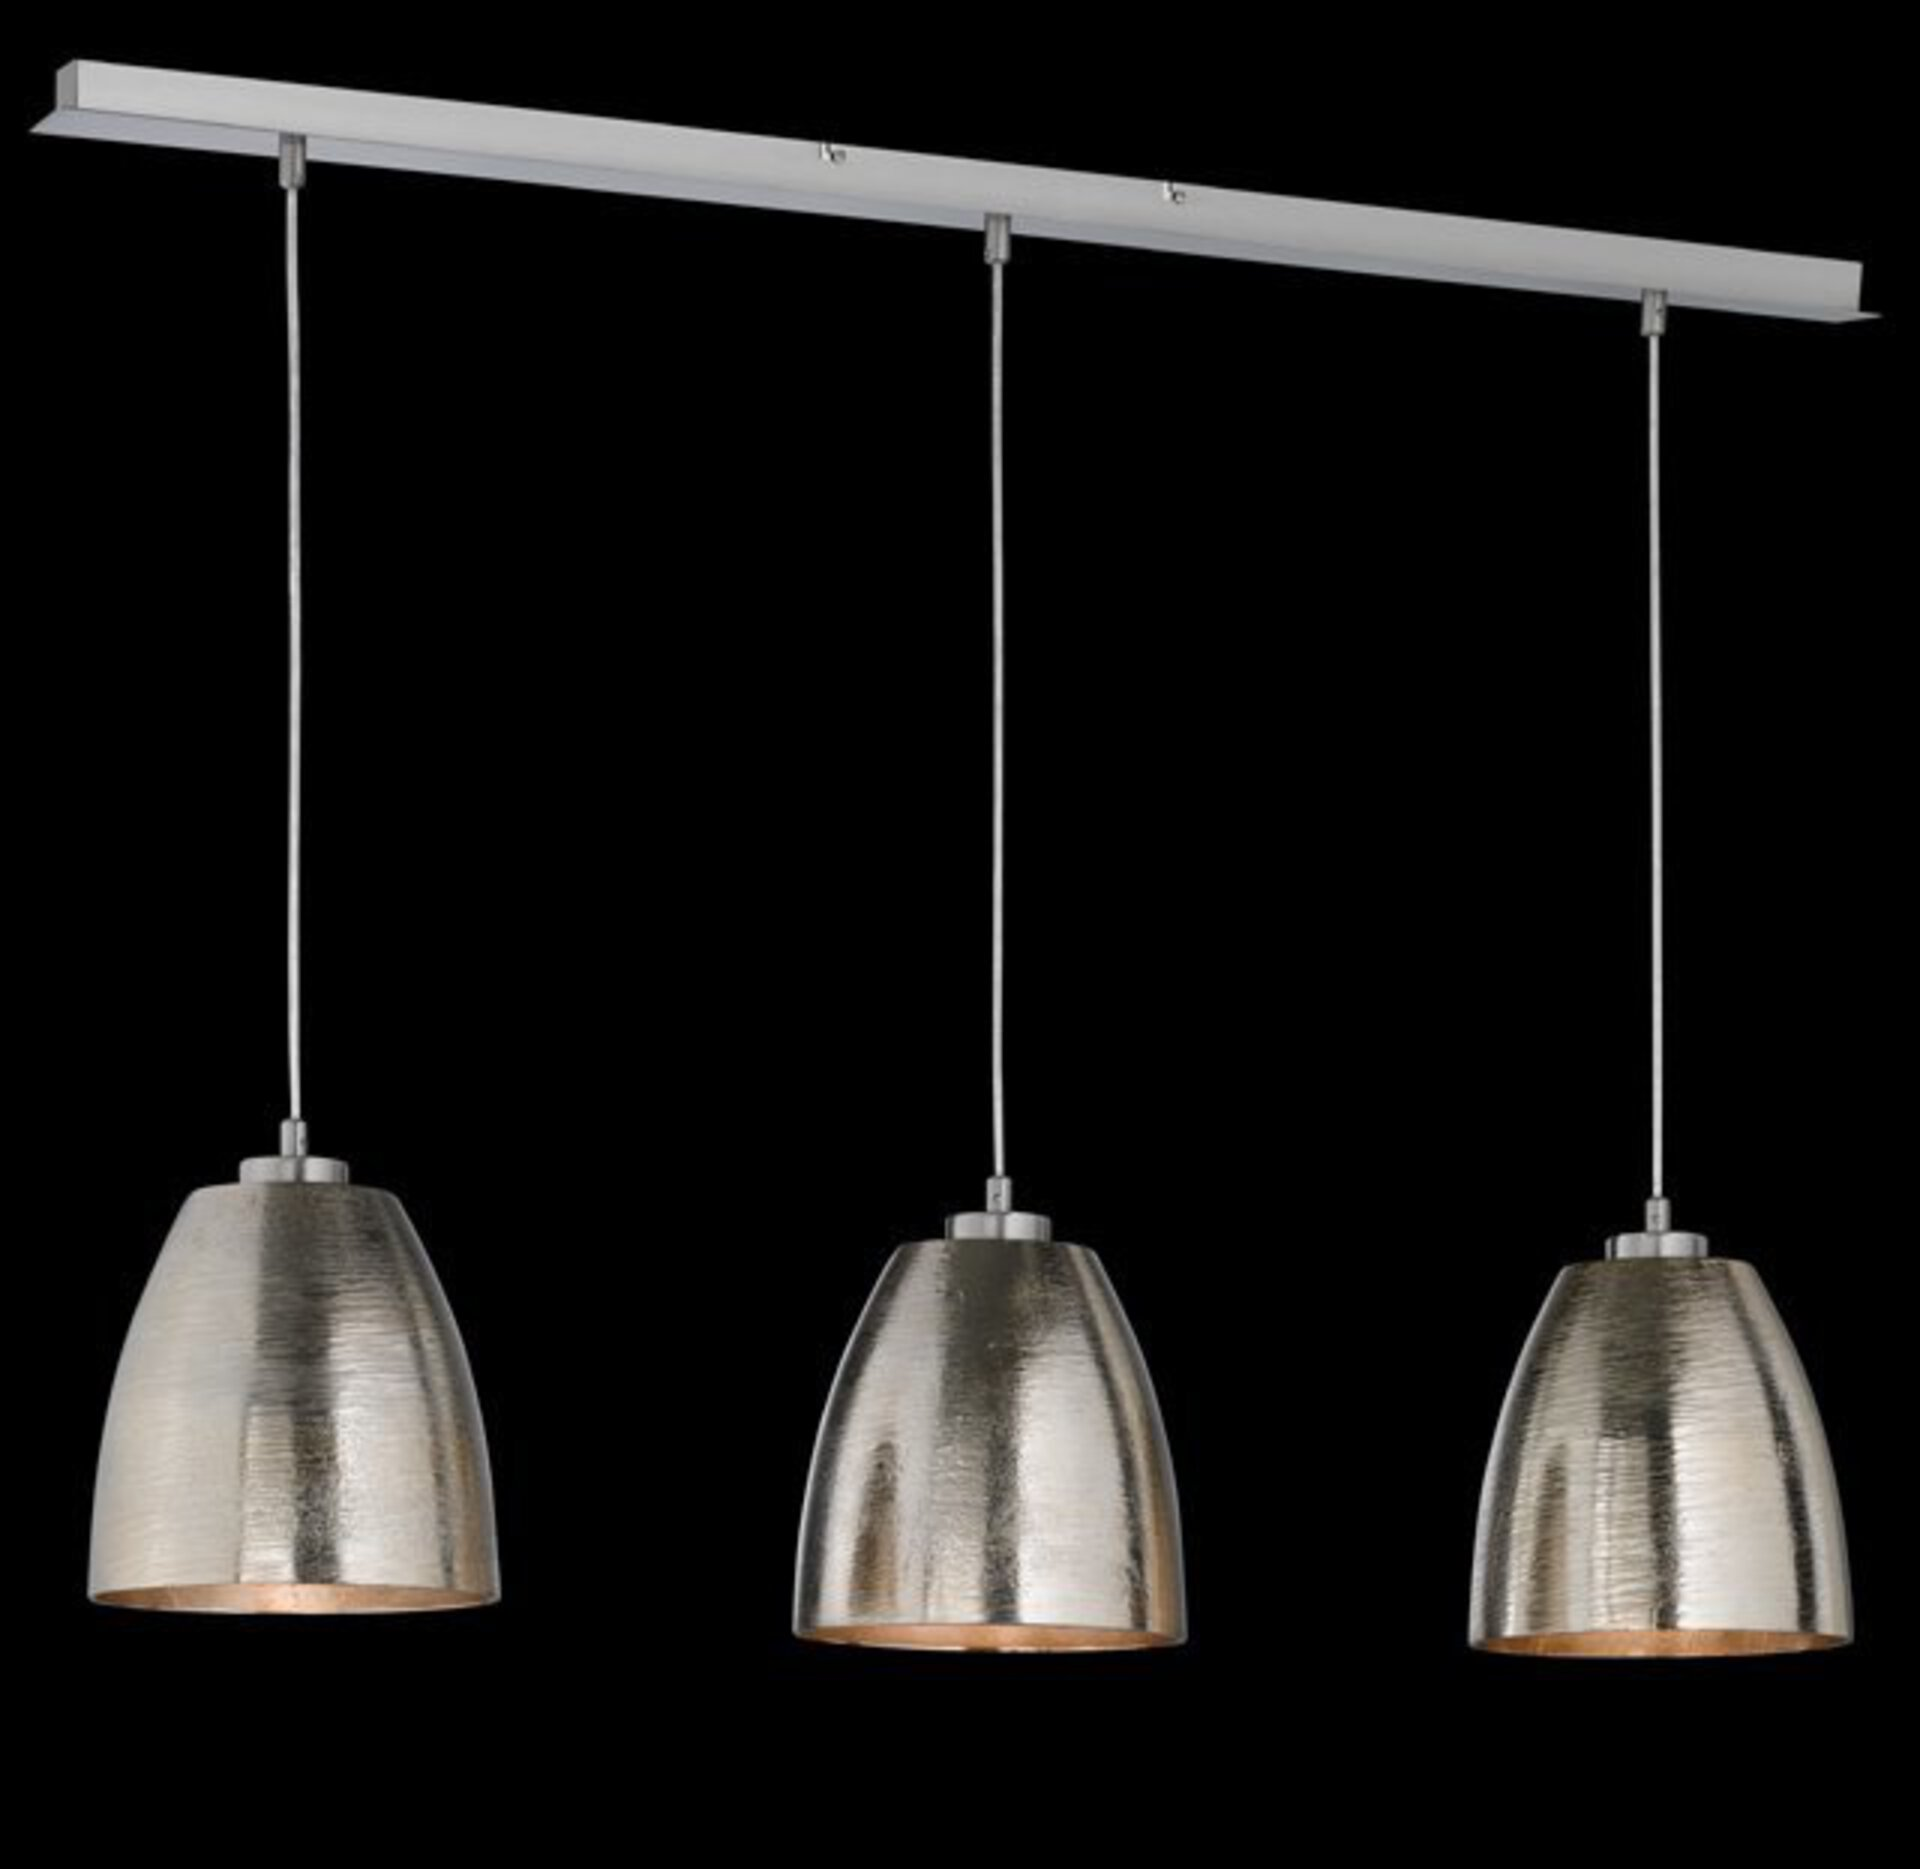 Hängeleuchte Cannes Fischer-Honsel Metall silber 21 x 200 x 107 cm